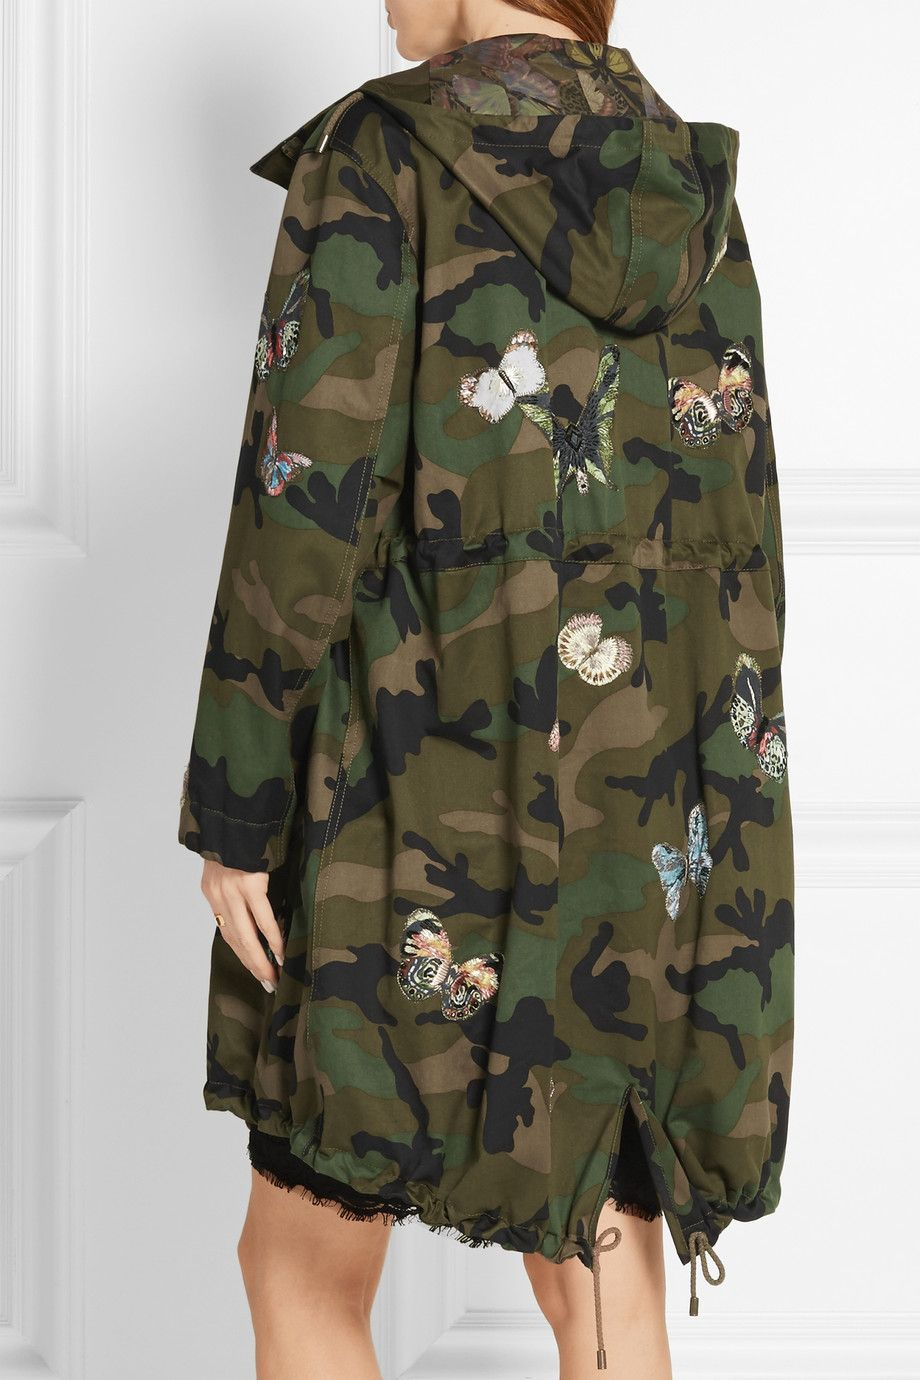 Veste army coton imprime camouflage